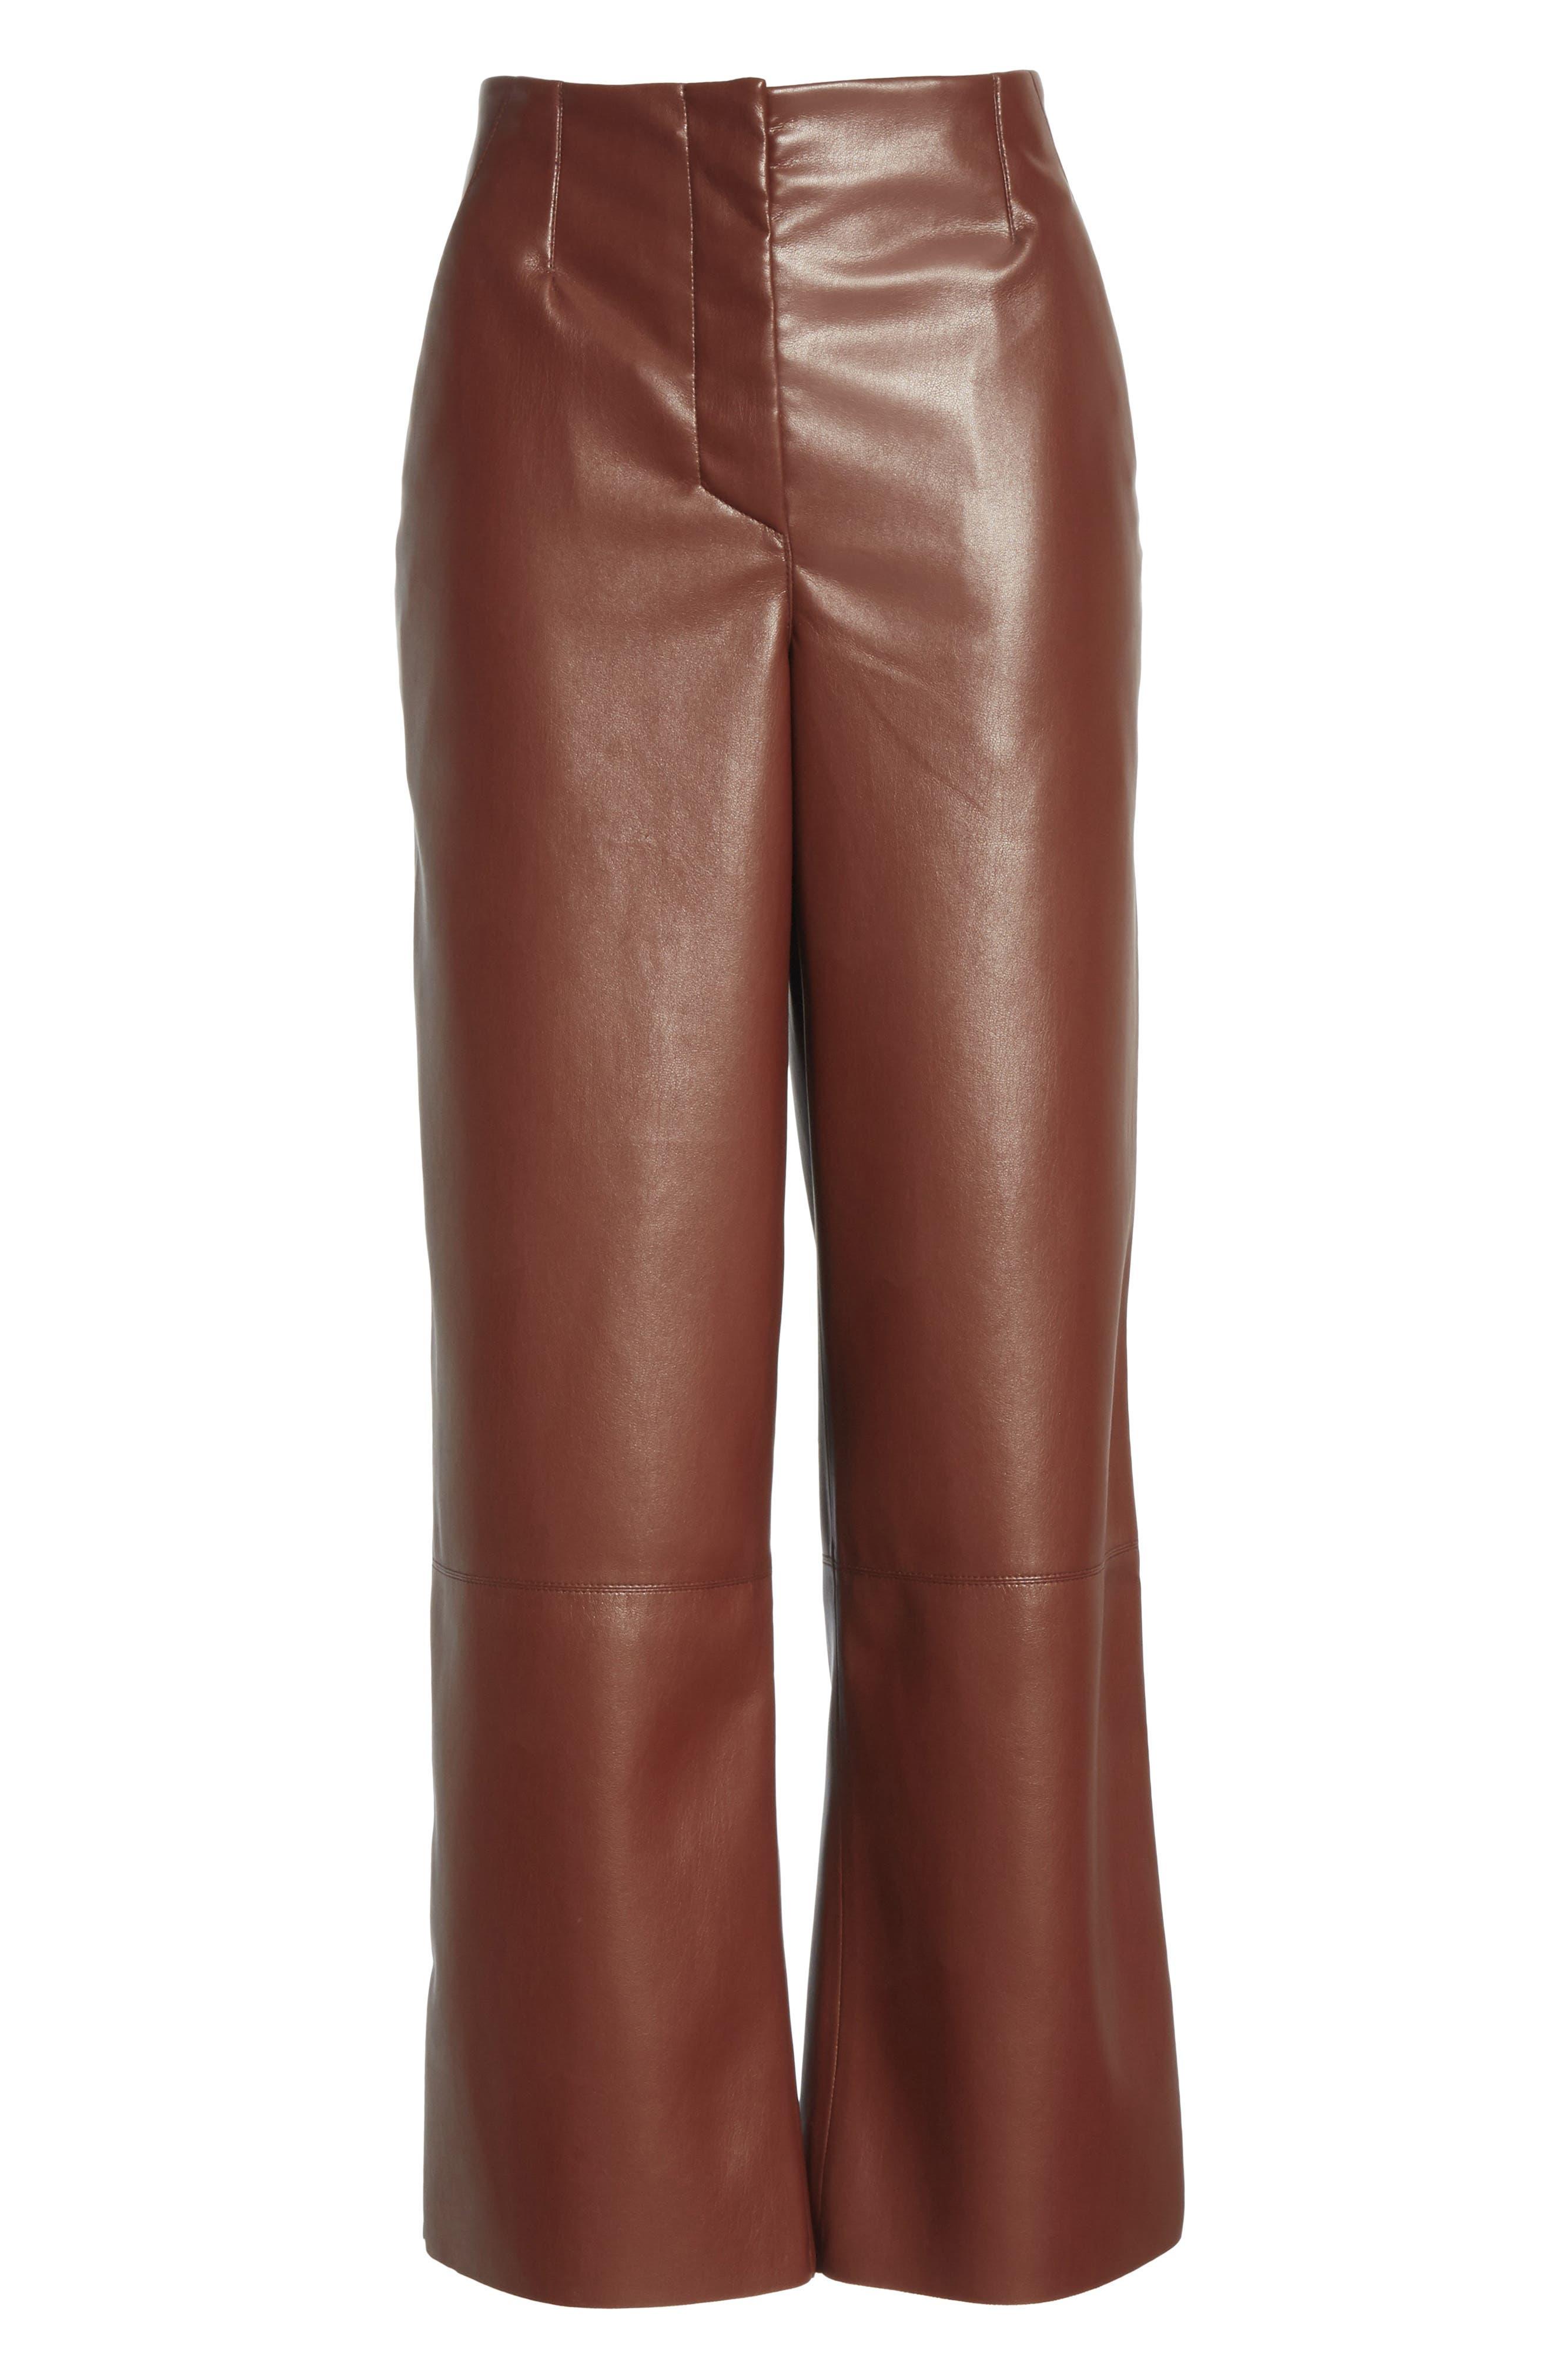 Africa Faux Leather Wide Leg Crop Pants,                             Alternate thumbnail 6, color,                             509